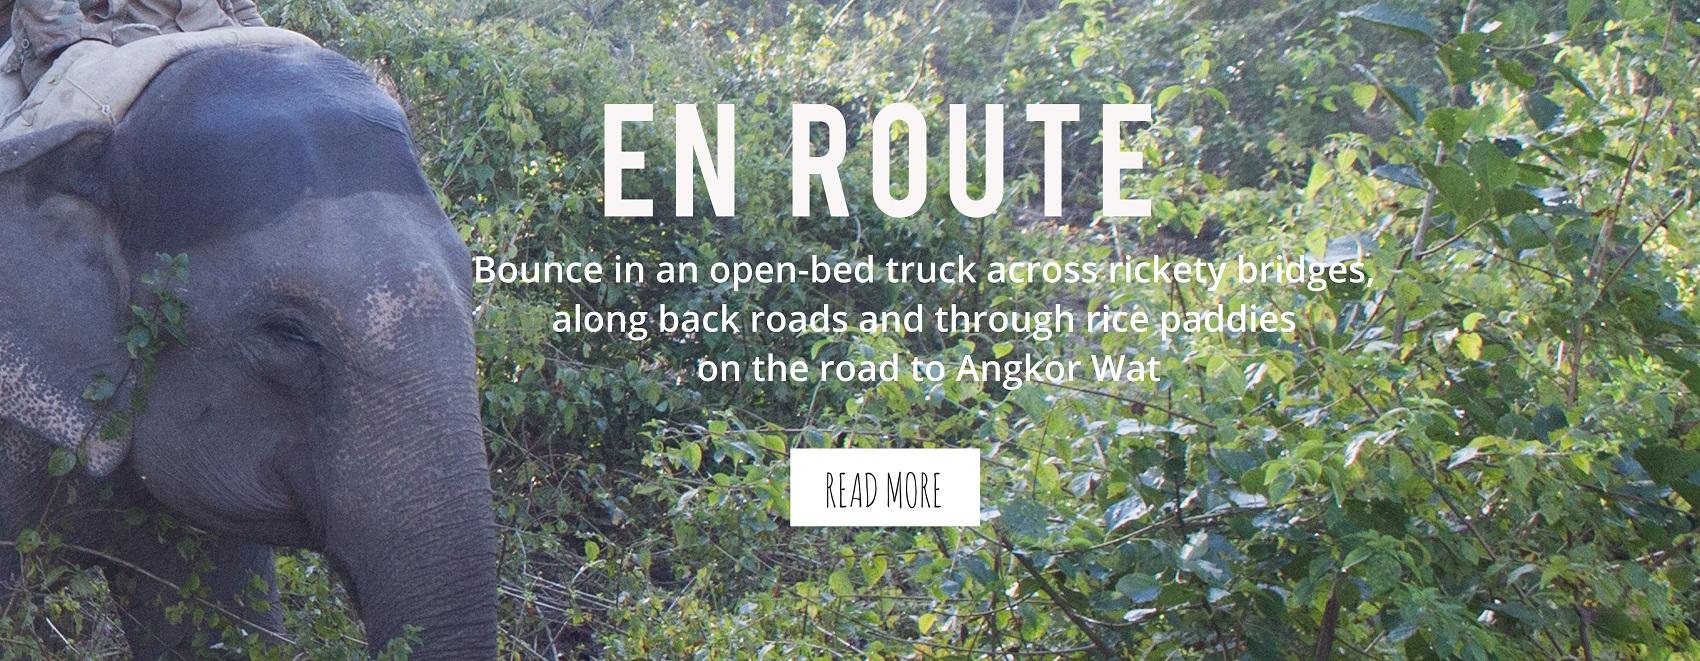 enroute-readmore2